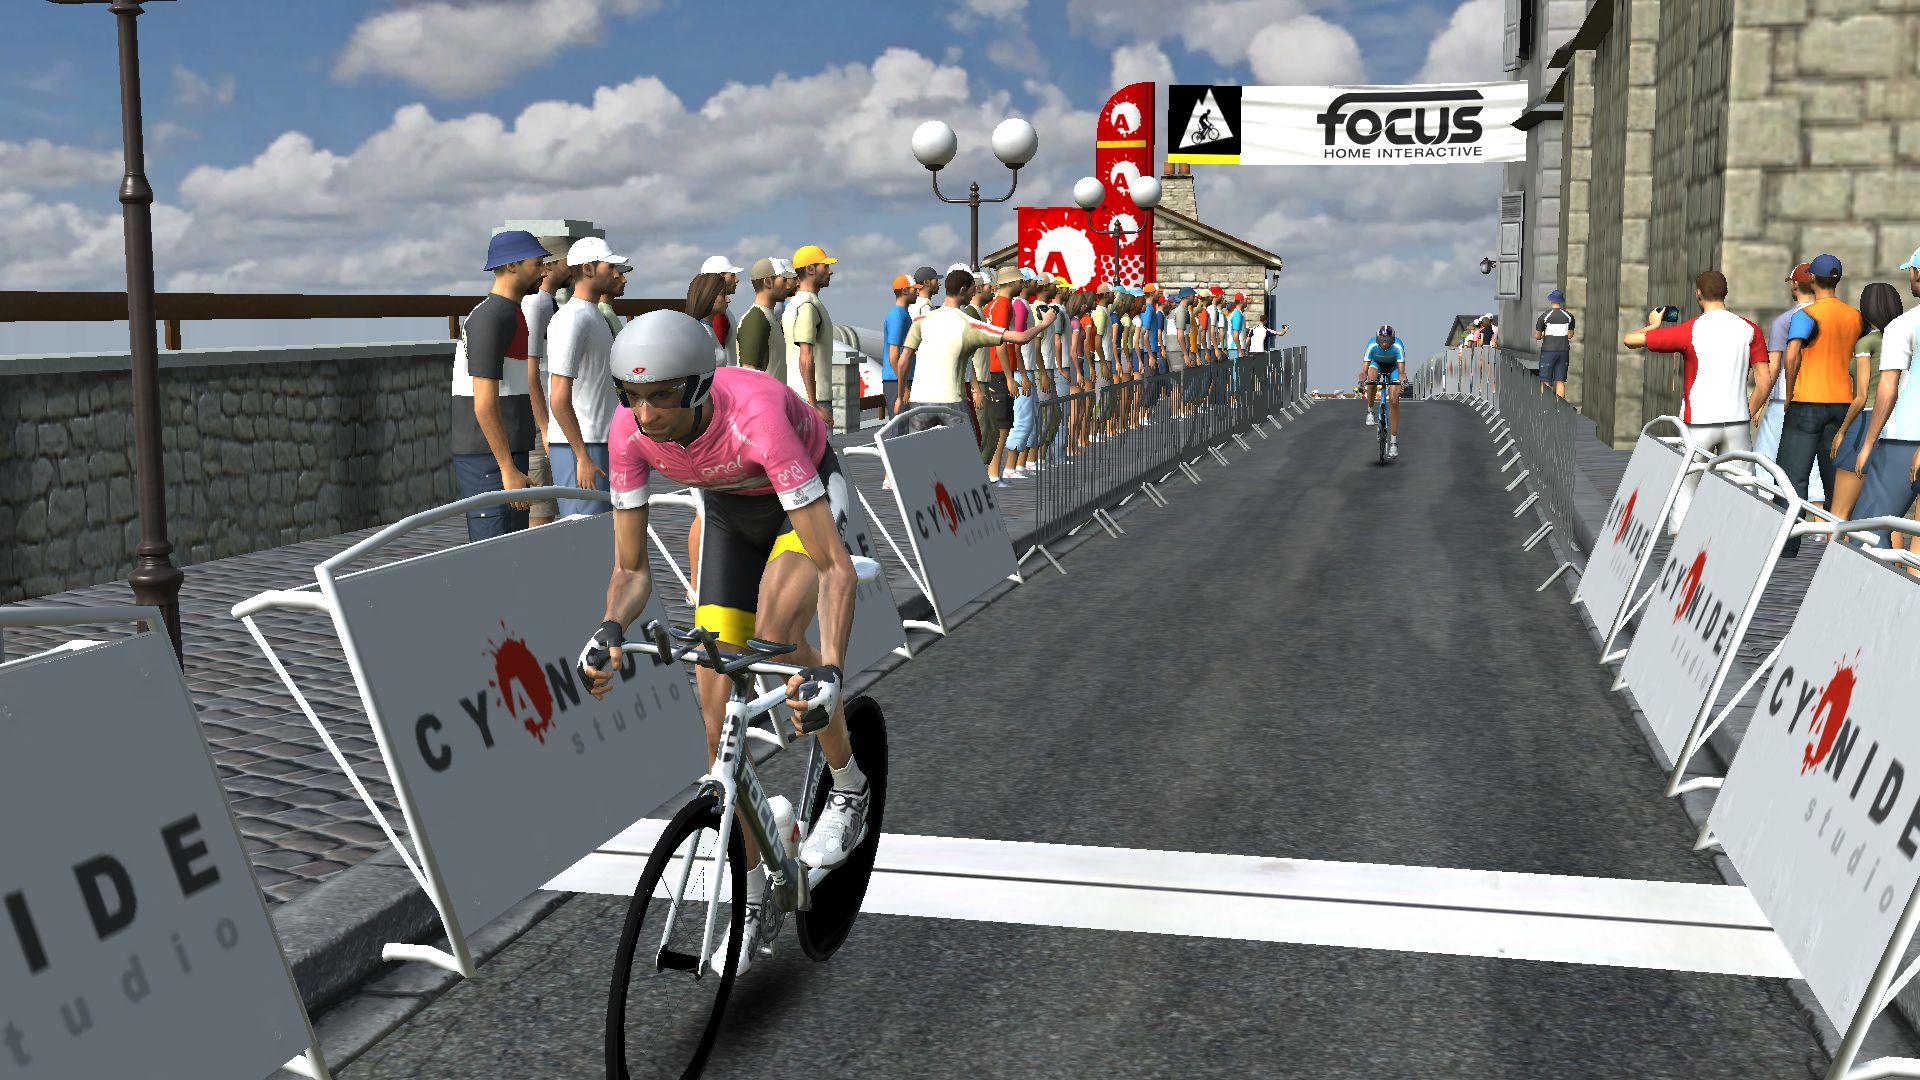 pcmdaily.com/images/mg/2019/Races/GTM/Giro/mg19_giro_09_PCM0070.jpg